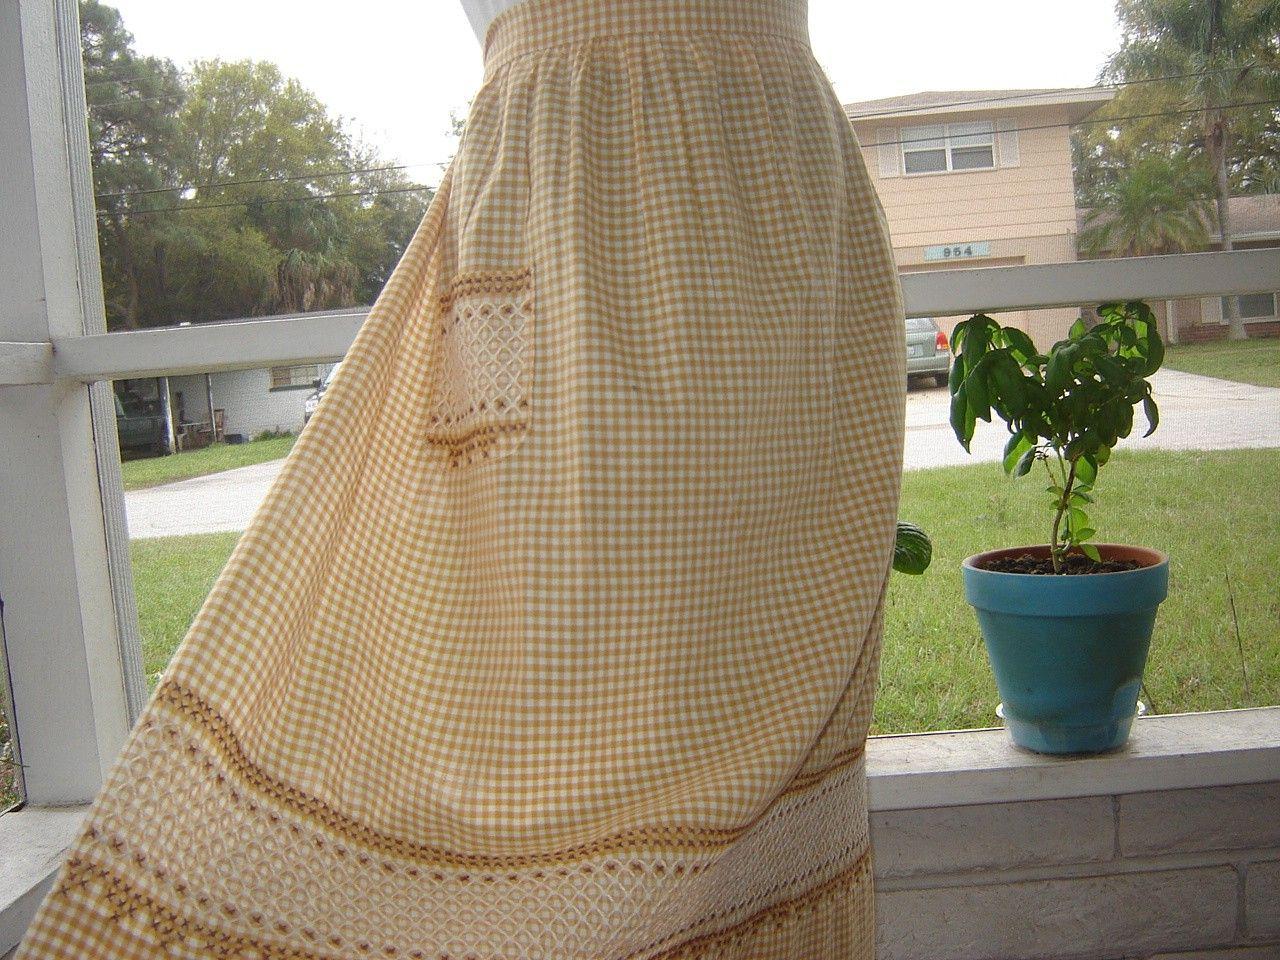 White half apron vintage - Vintage Half Apron In Caramel And White Gingham 18 00 Via Etsy